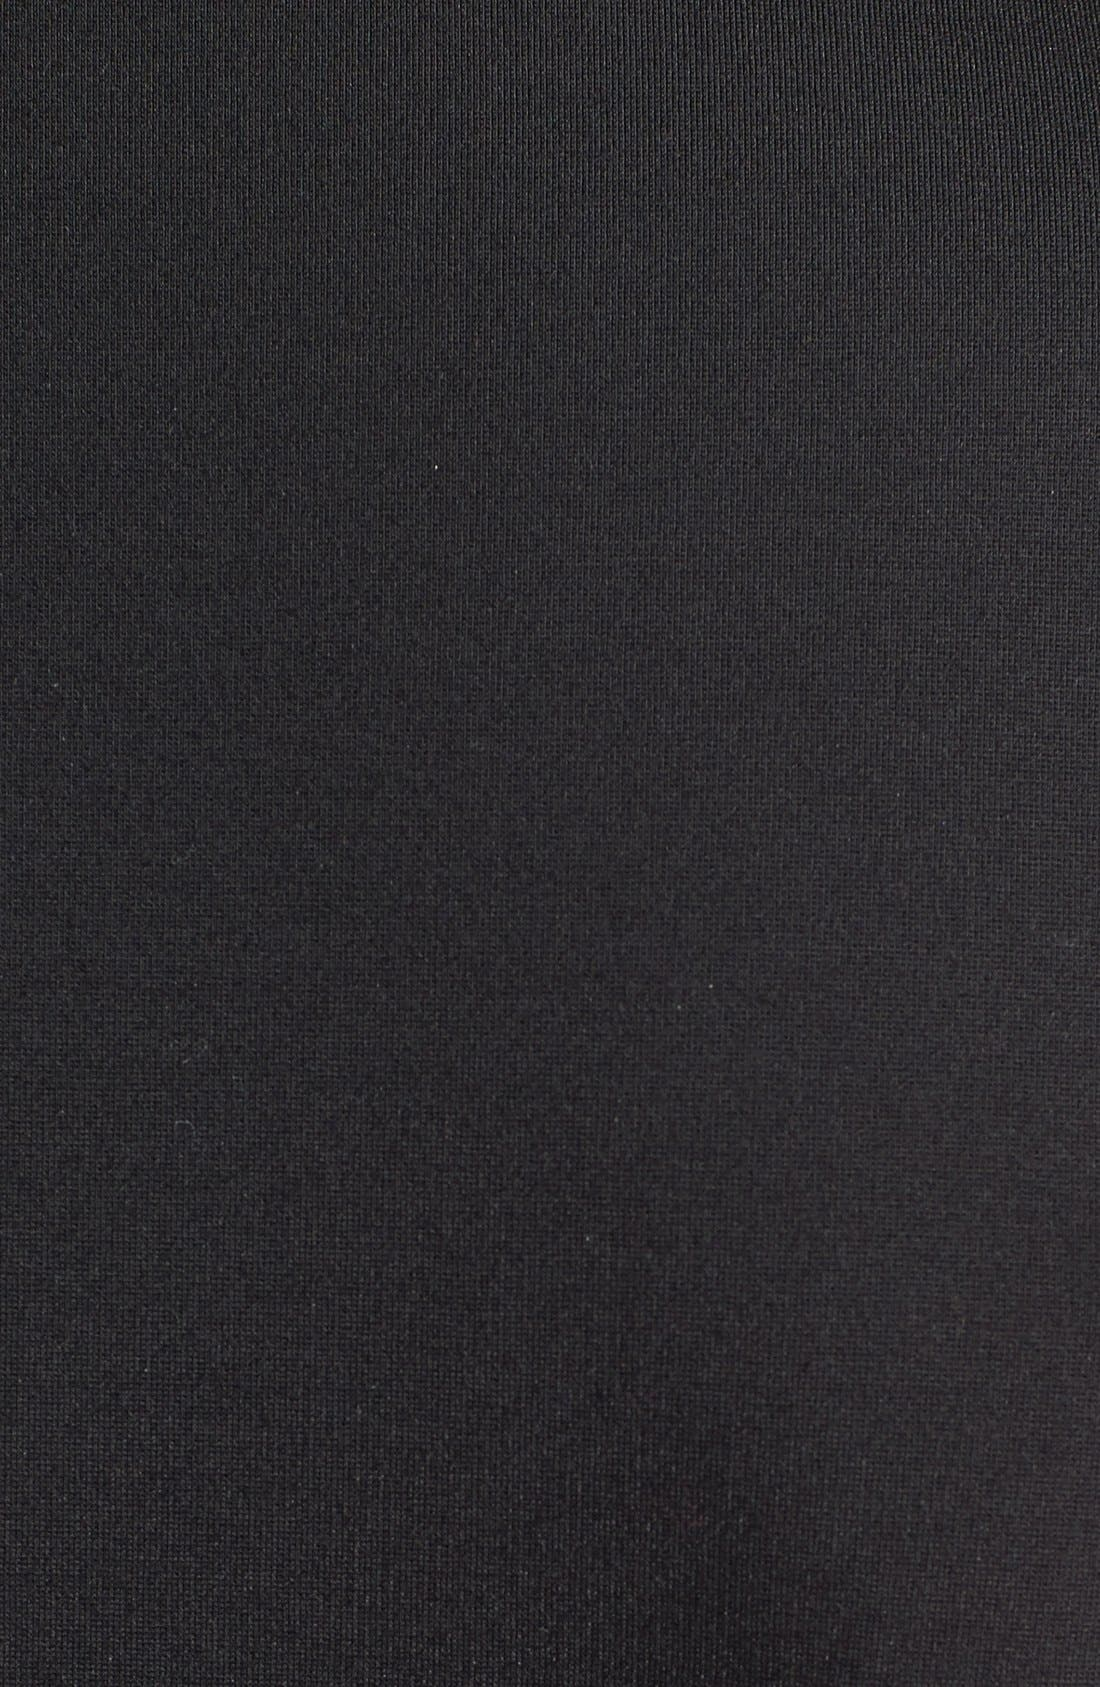 Alternate Image 3  - Tahari Starburst Ponte Sheath Dress (Plus Size)